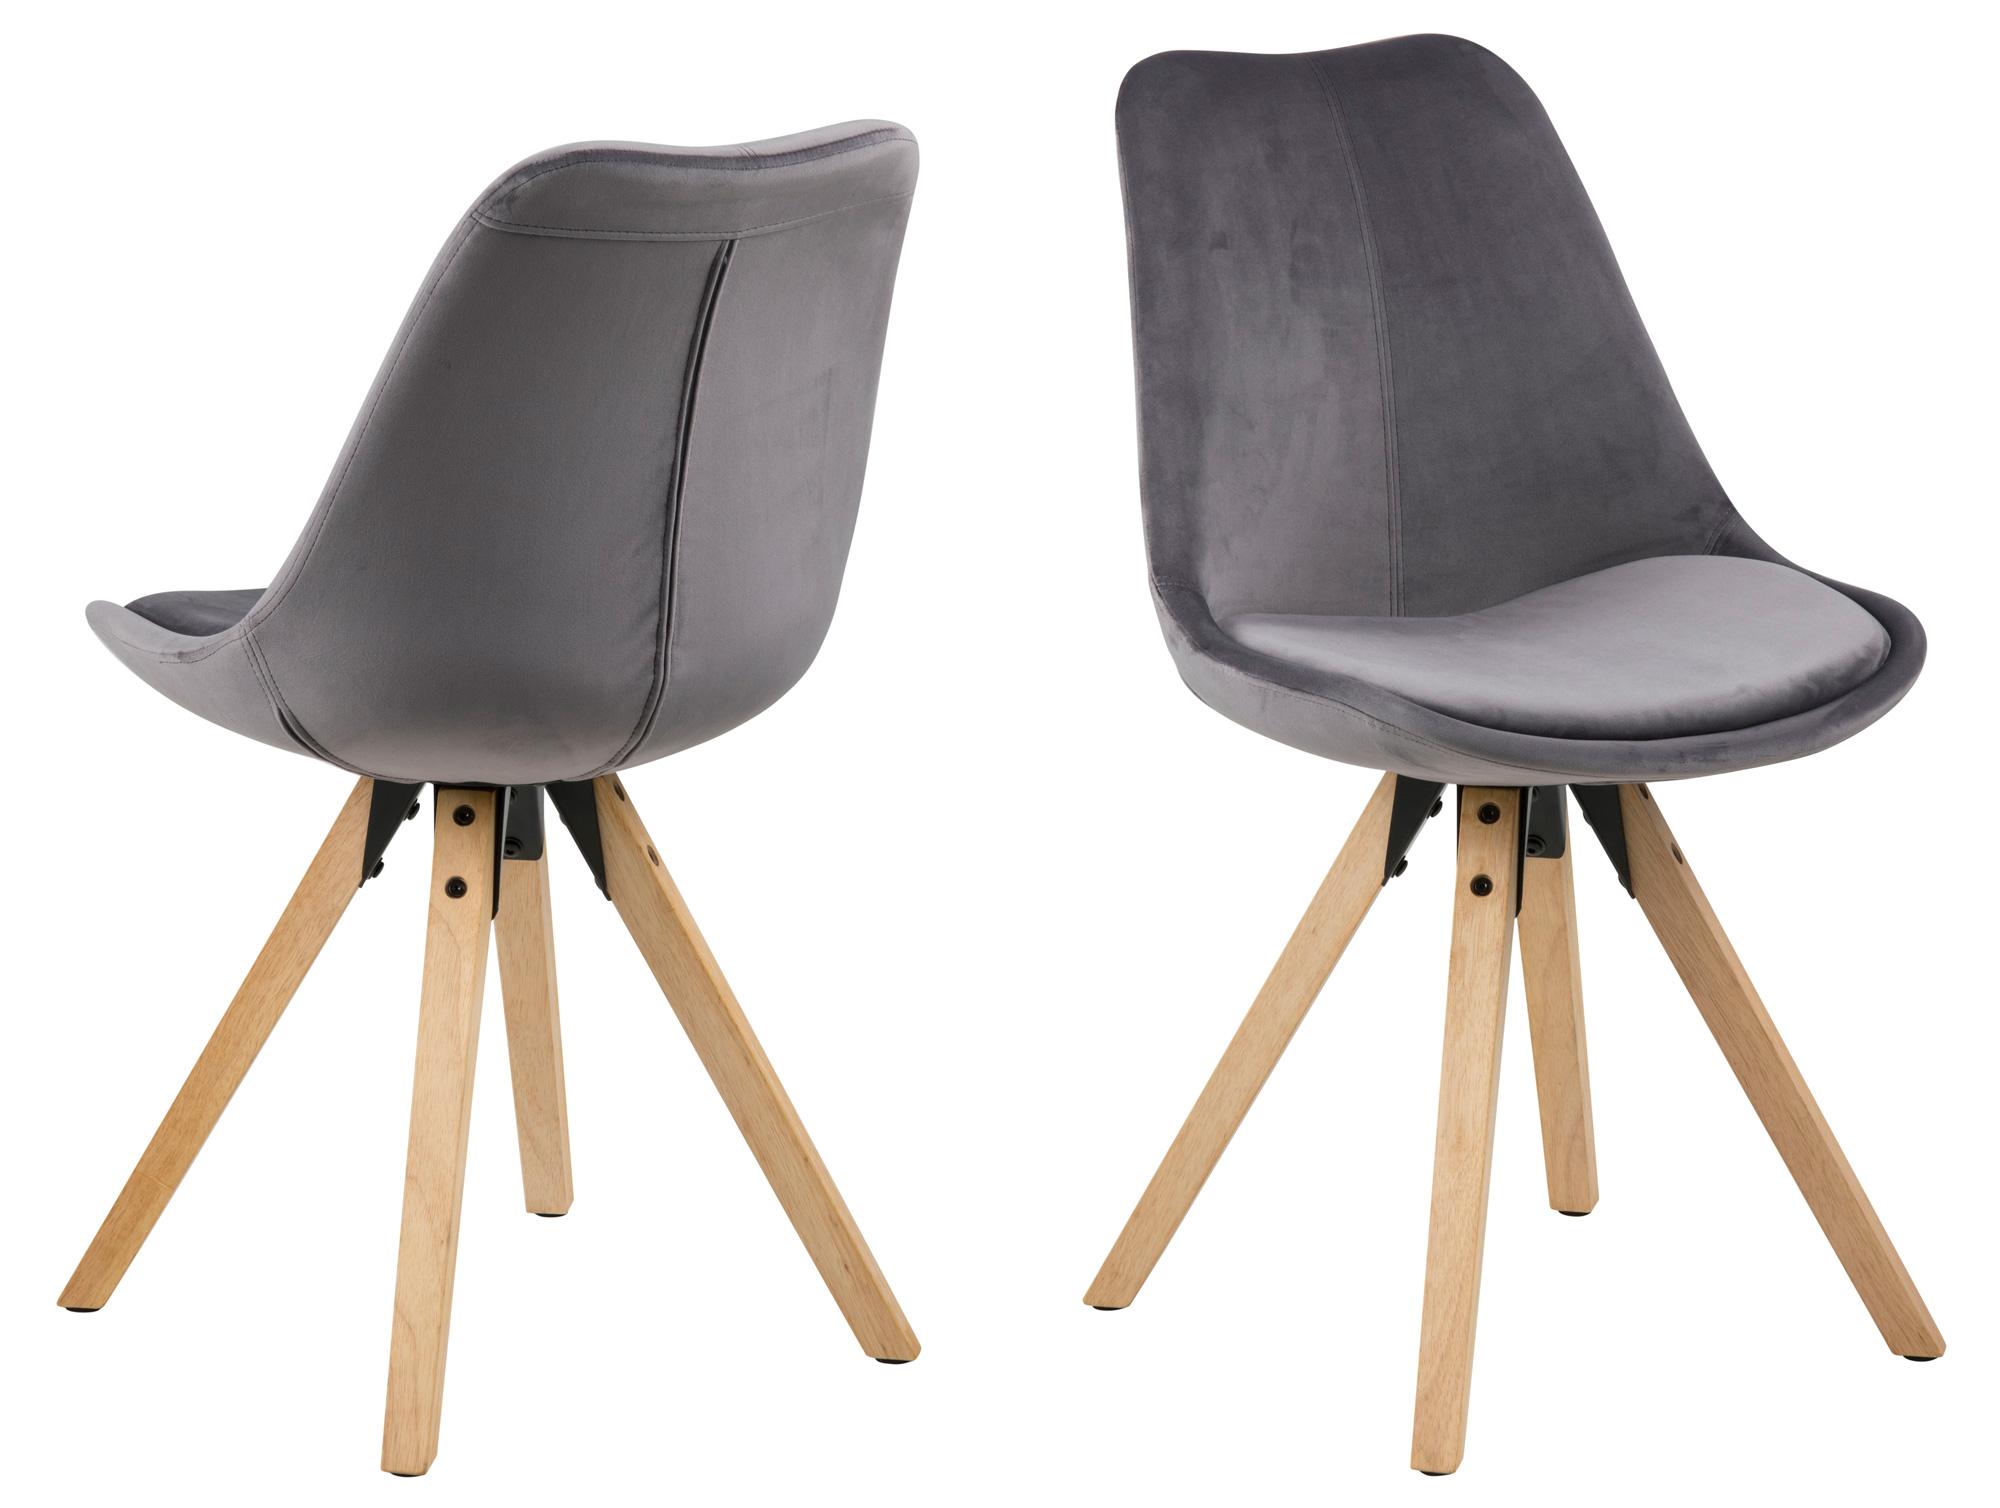 Schalen stuhl amazing wssner dining comfort stuhl bezug for Plastik schalenstuhl